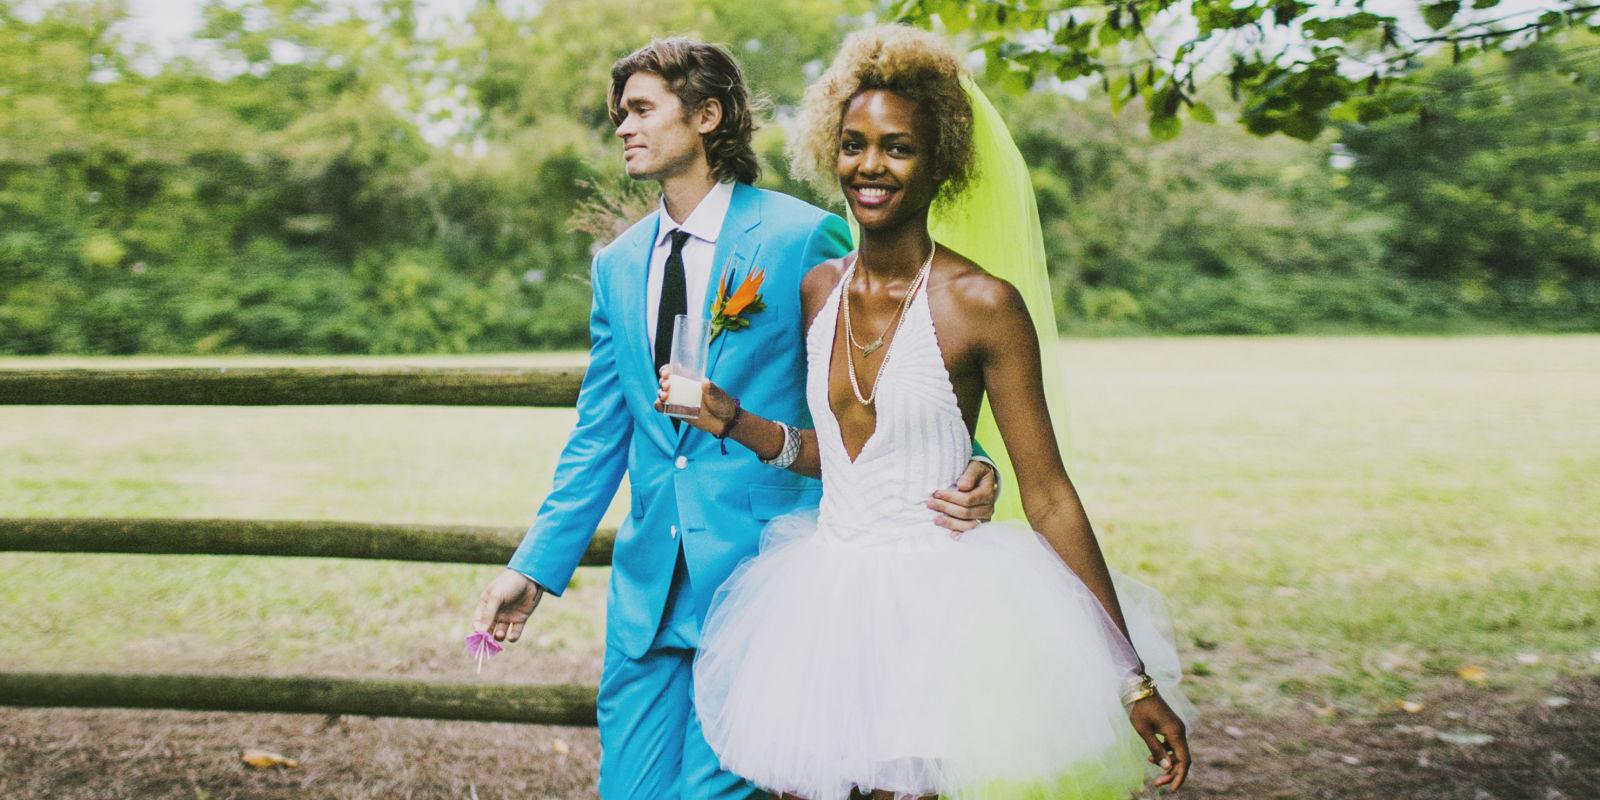 fashion personal style news neon wedding